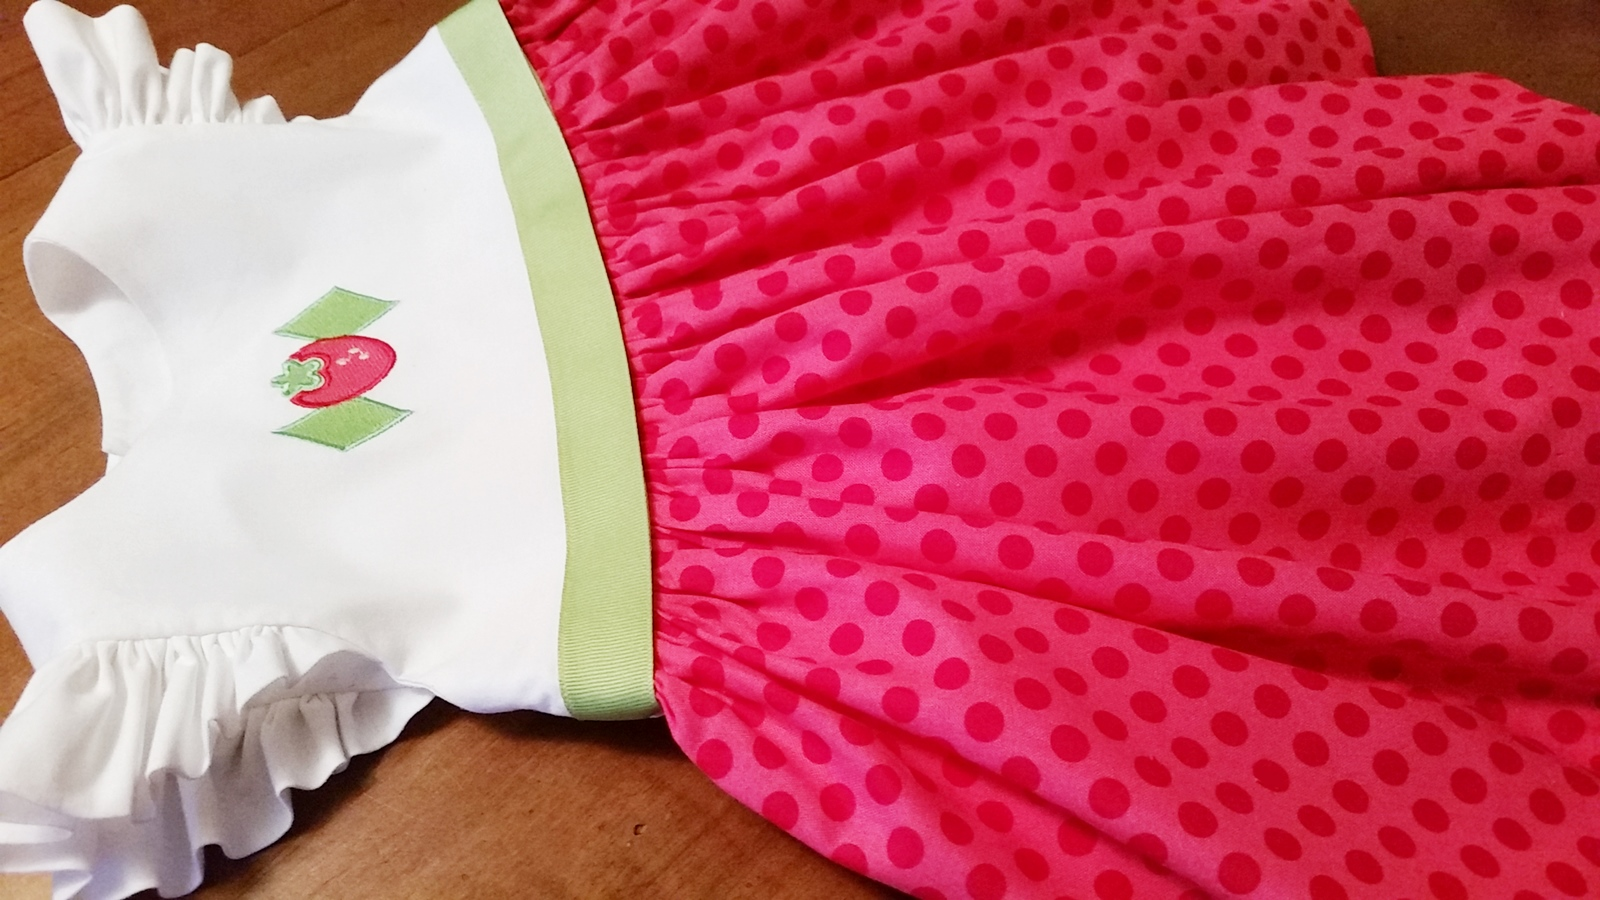 Strawberry Shortcake inspired dress-